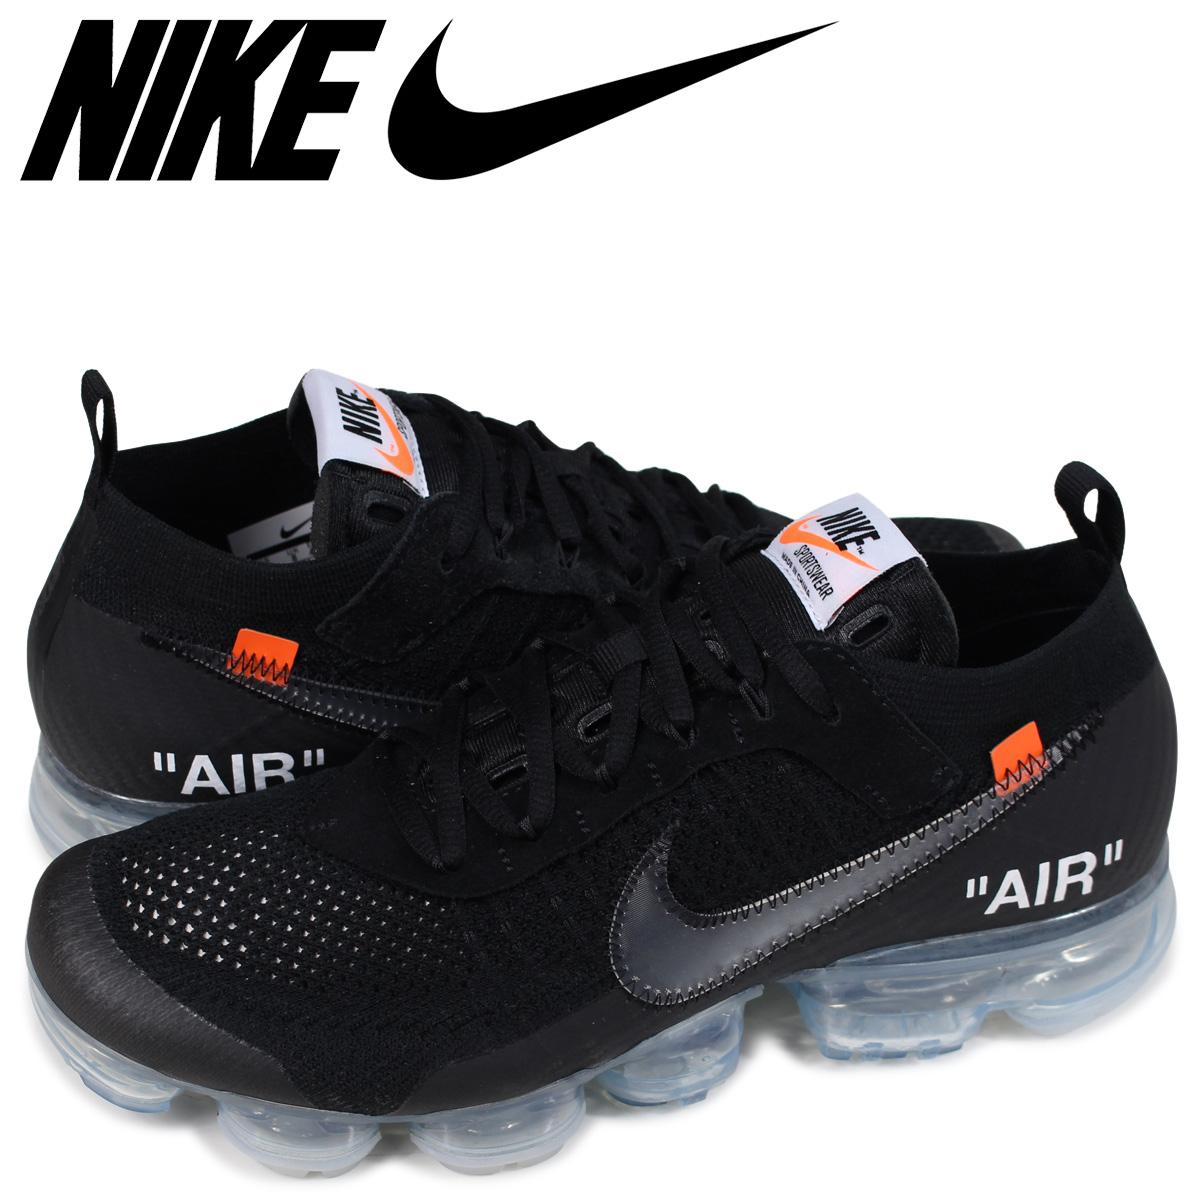 8acae92476c ALLSPORTS  NIKE AIR VAPORMAX FLYKNIT THE TEN Nike air vapor max ...